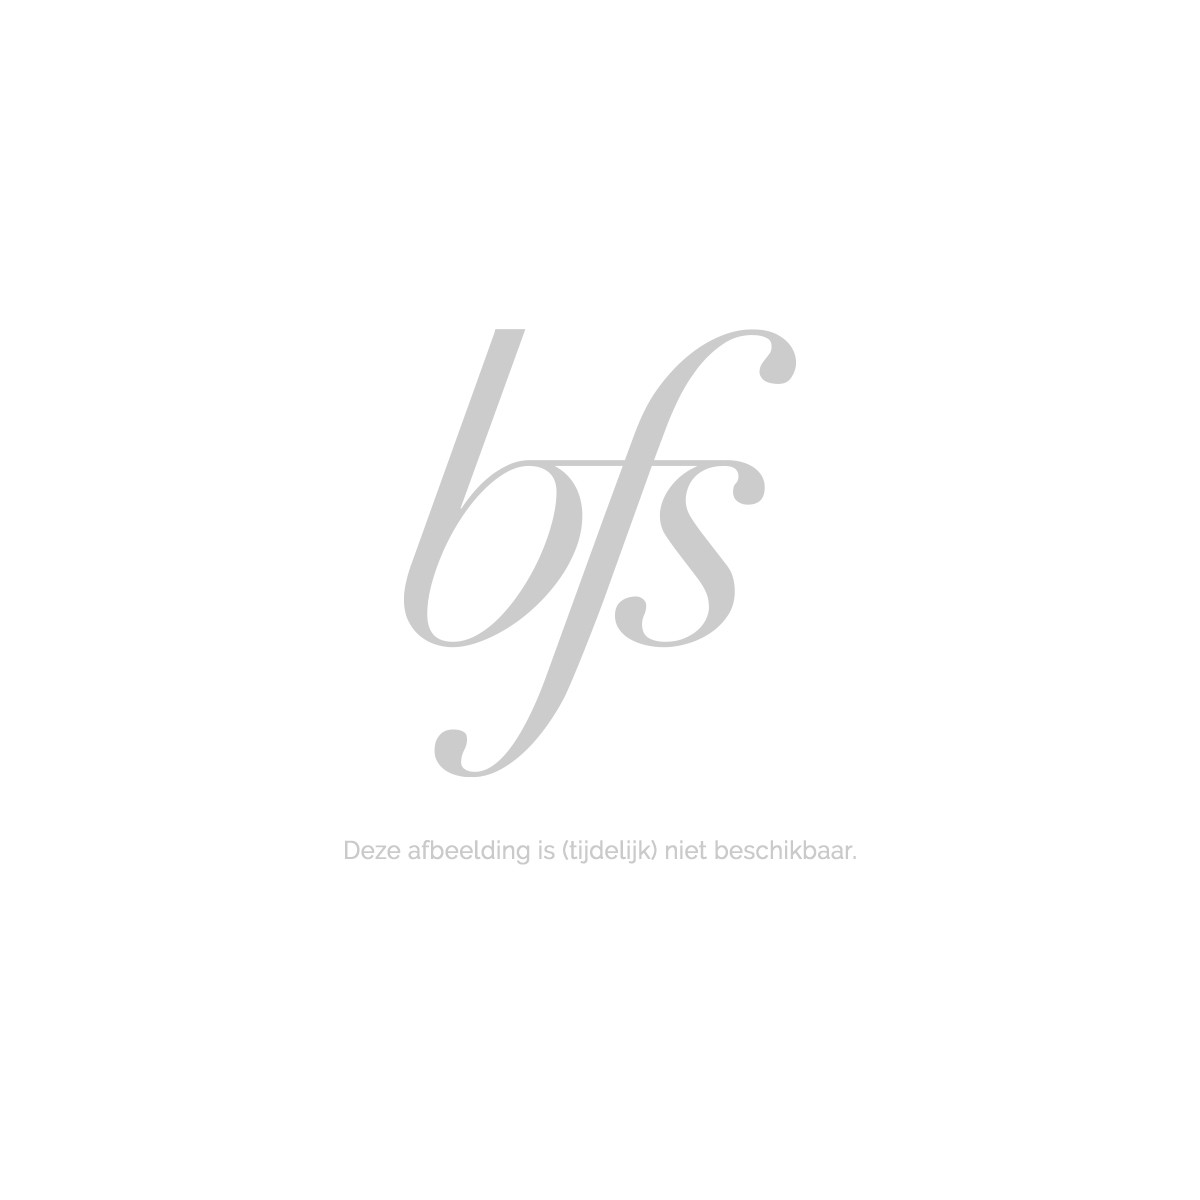 Shiseido Ben.Wr.24 Pure Retinol Express Eye Mask